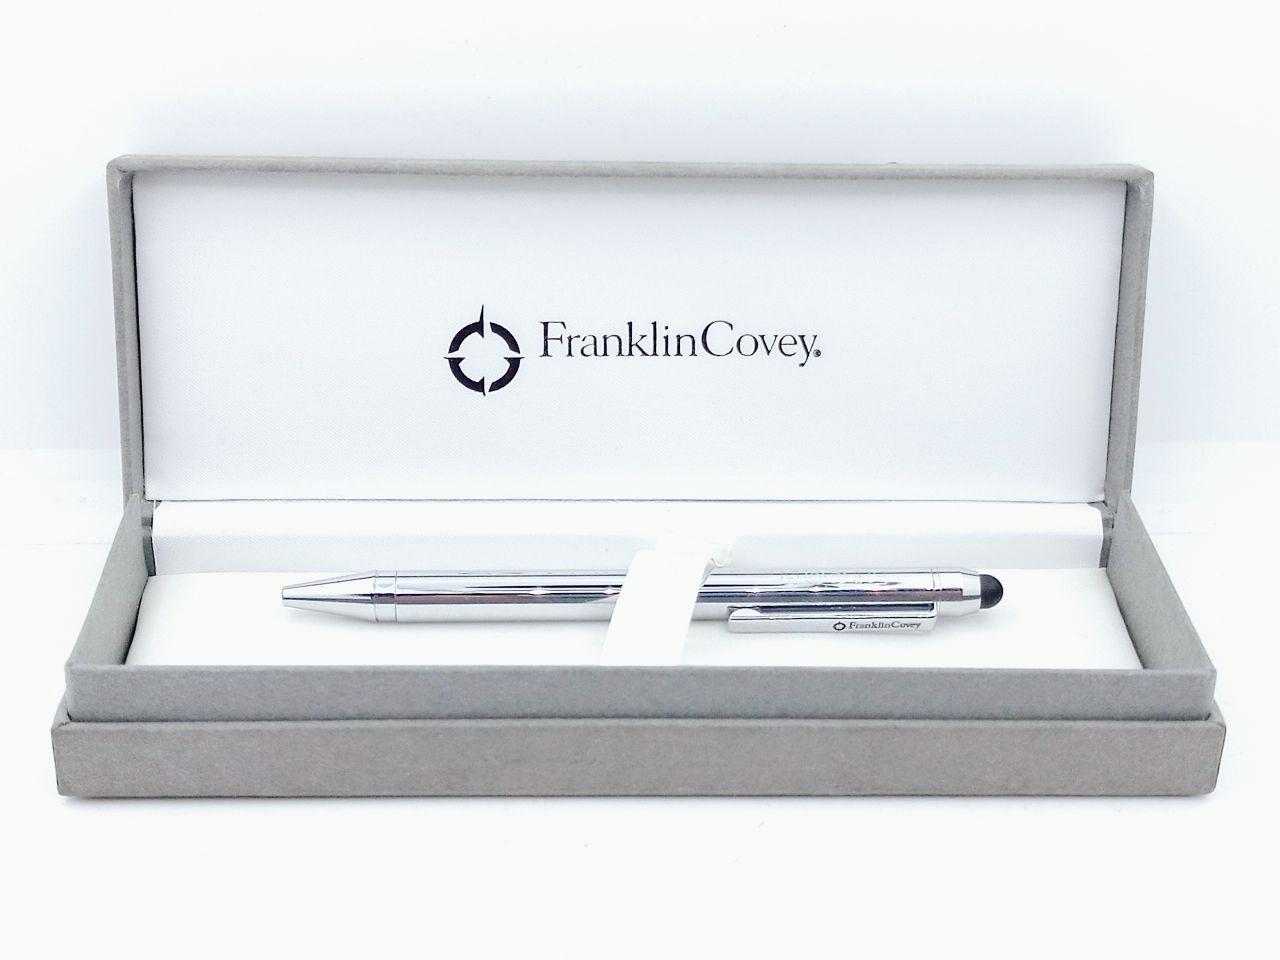 FranklinCovey Ballpoint Pen FC0112-2